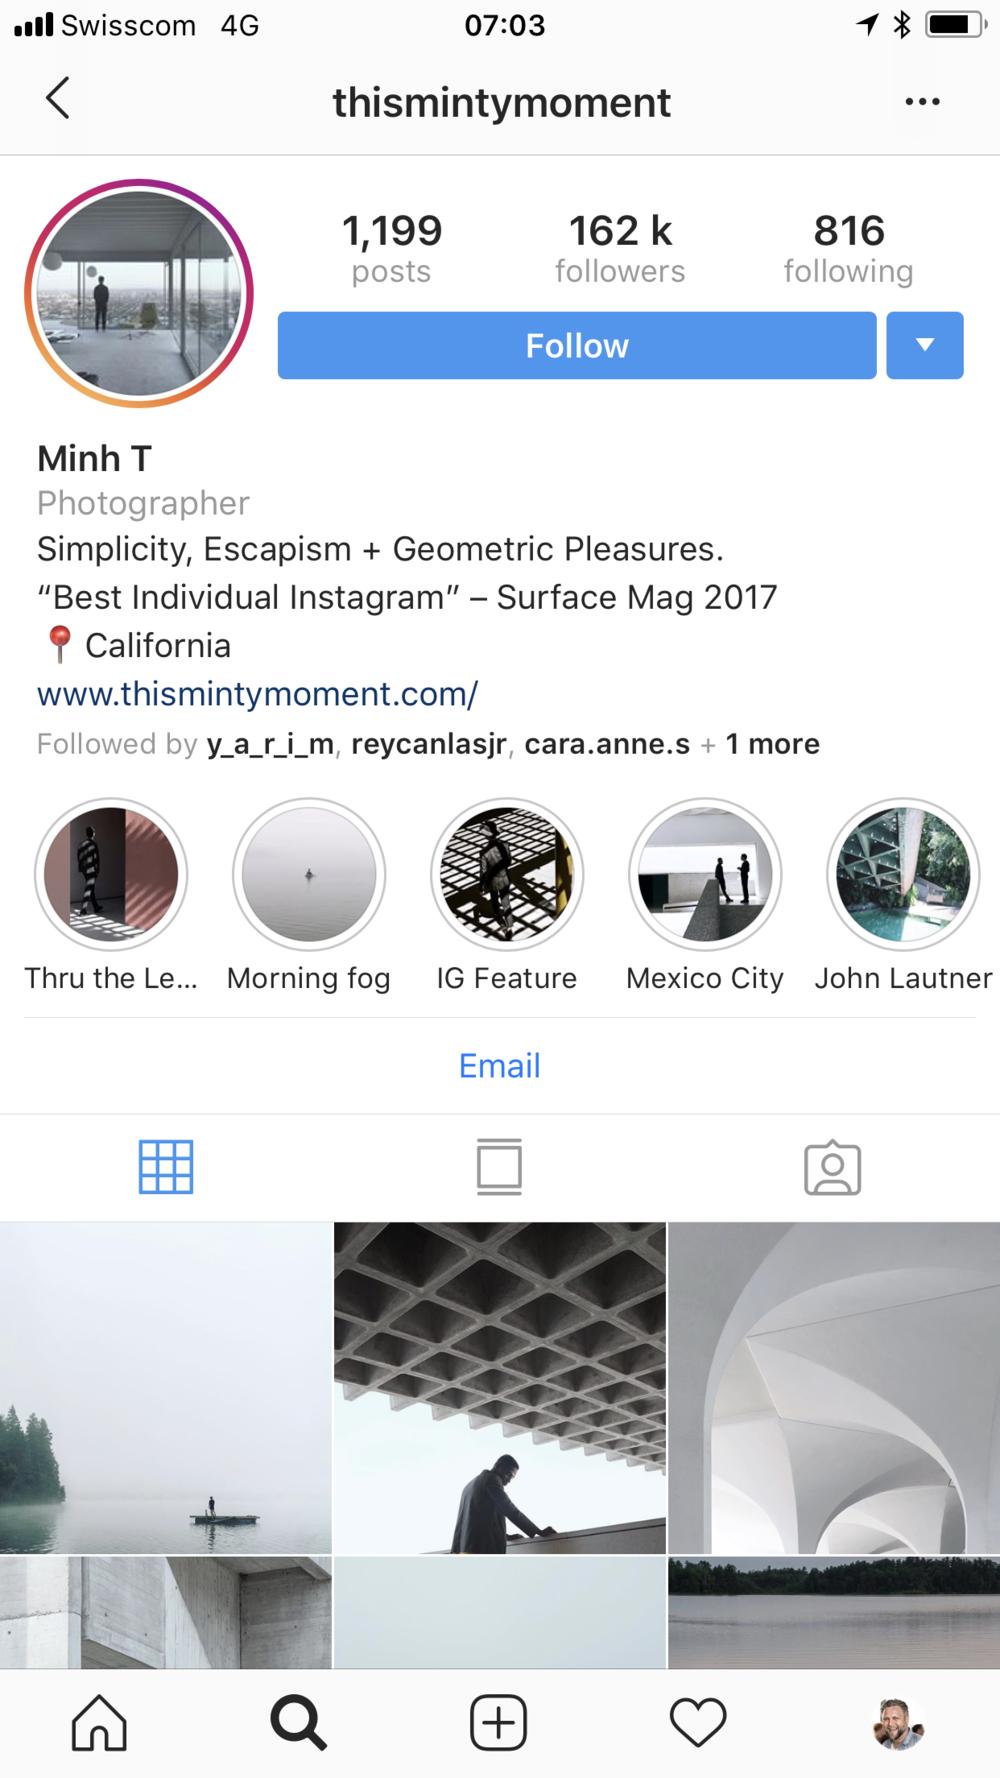 Dan_Roznov_Instagram_Storytelling_digitalEVENT2018_8.png